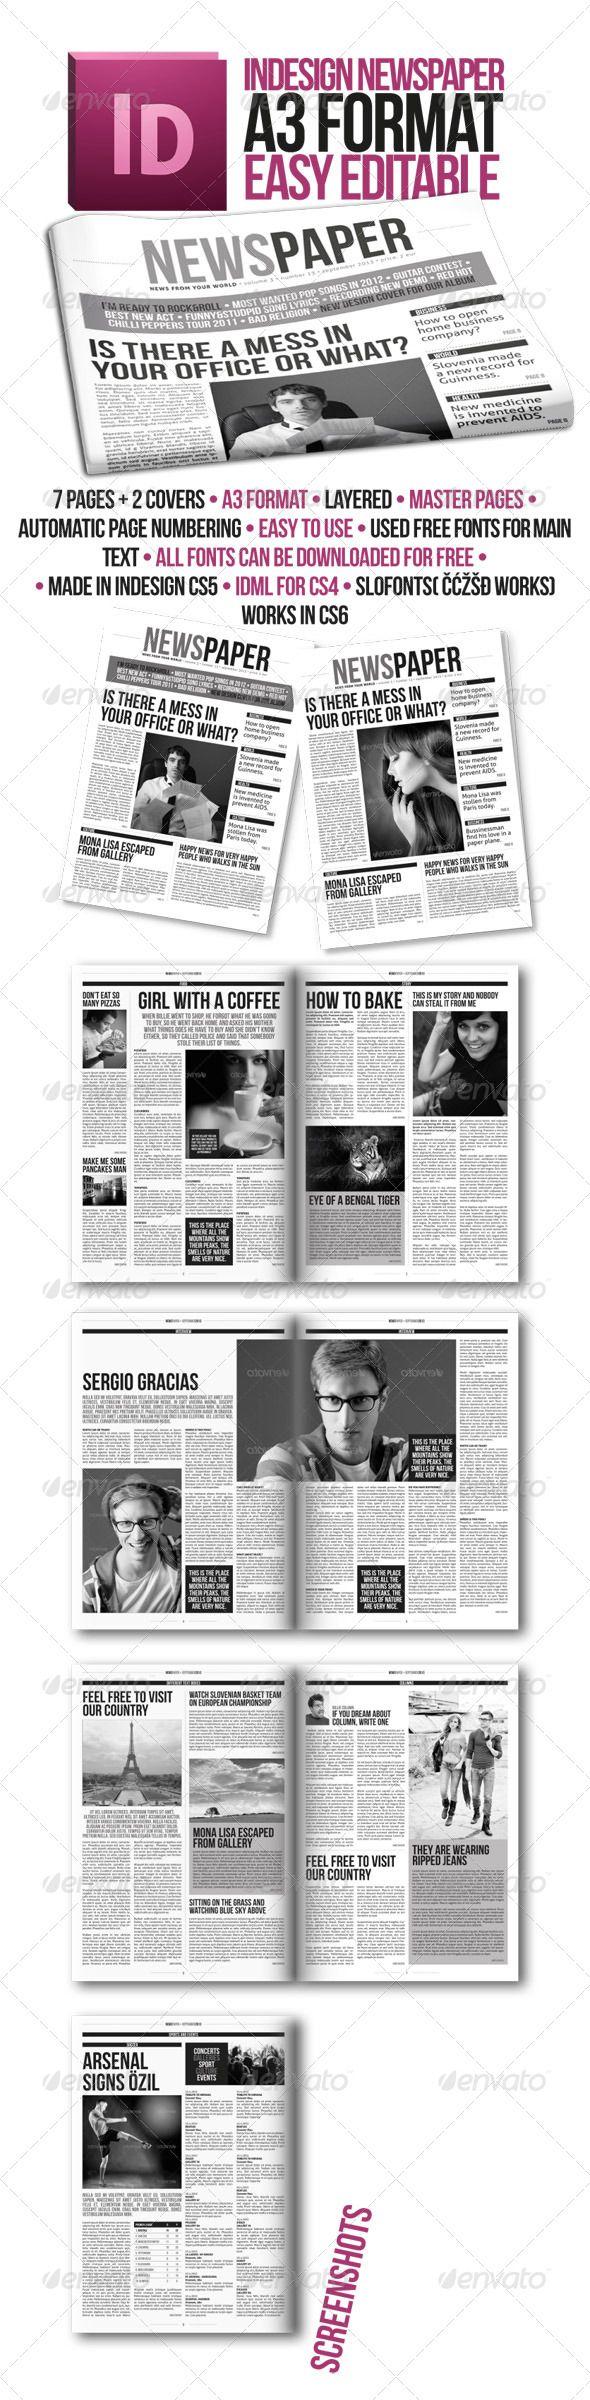 Indesign Modern Newspaper Magazine Template A3